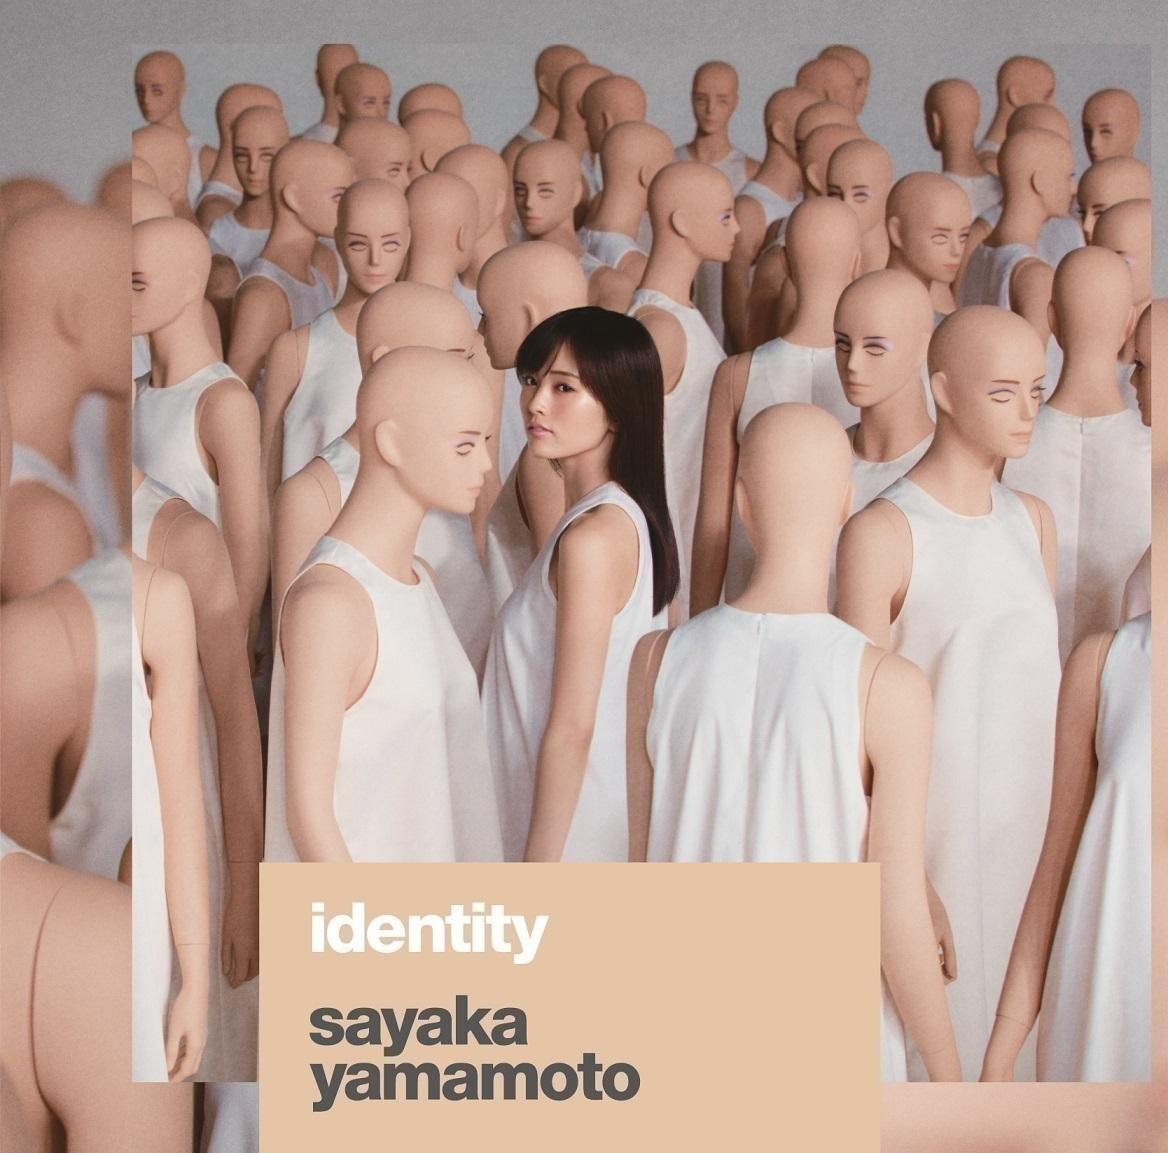 20171020.2229.12 Sayaka Yamamoto - identity (M4A) cover 1.jpg